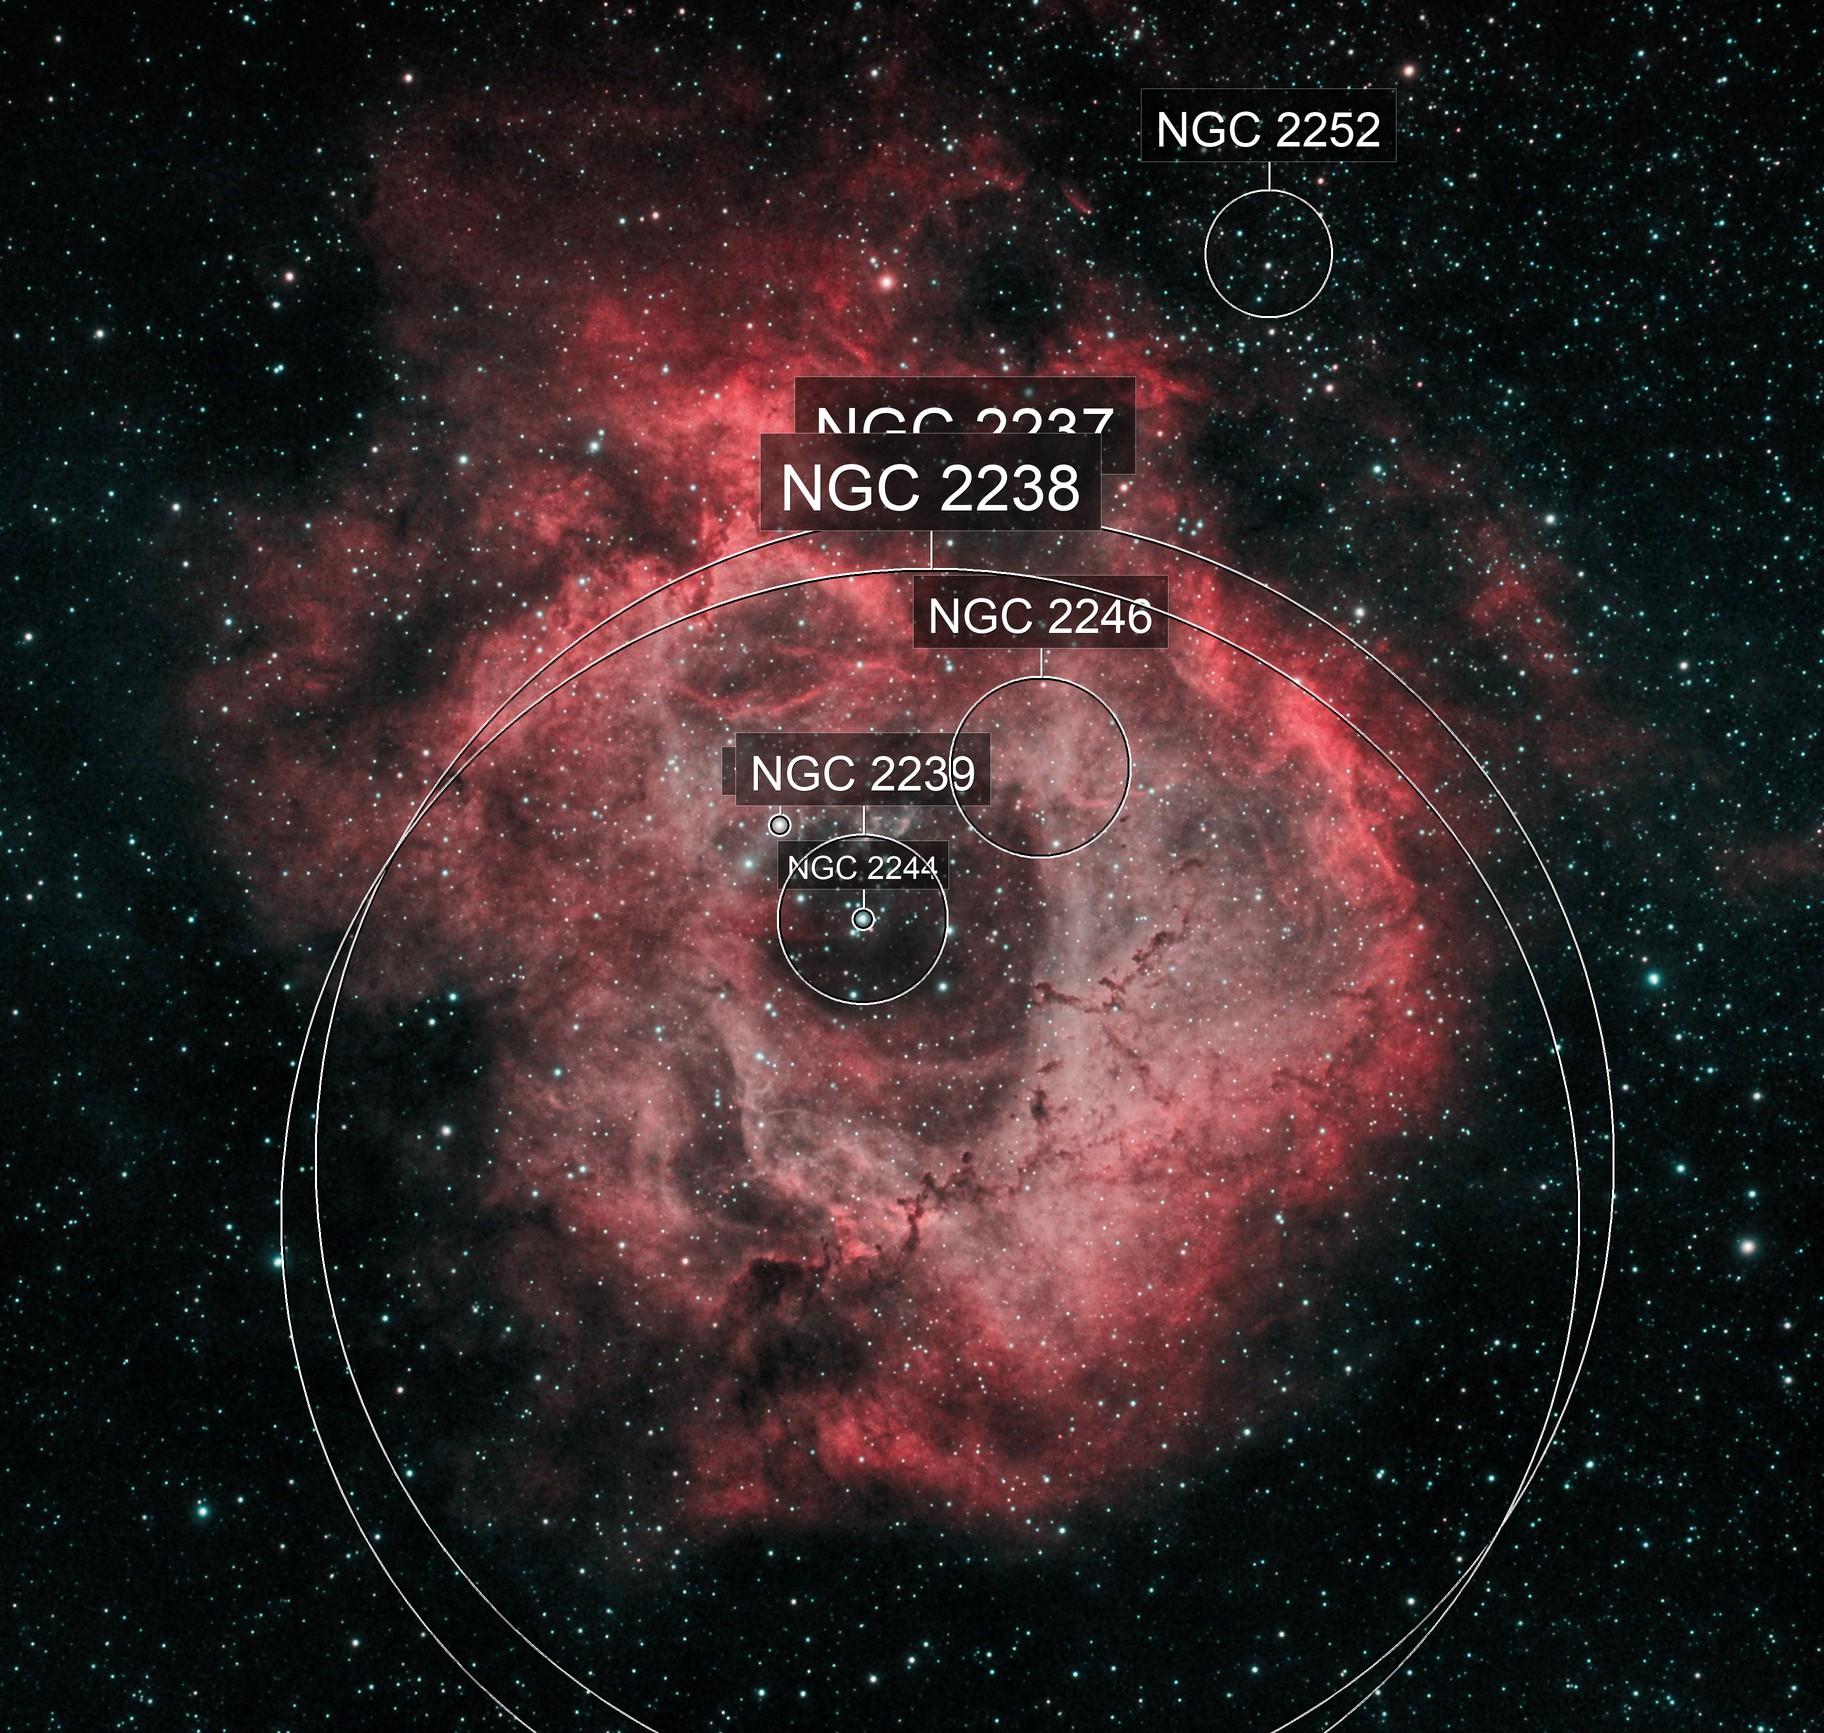 Rosette Nebula, NGC 2237